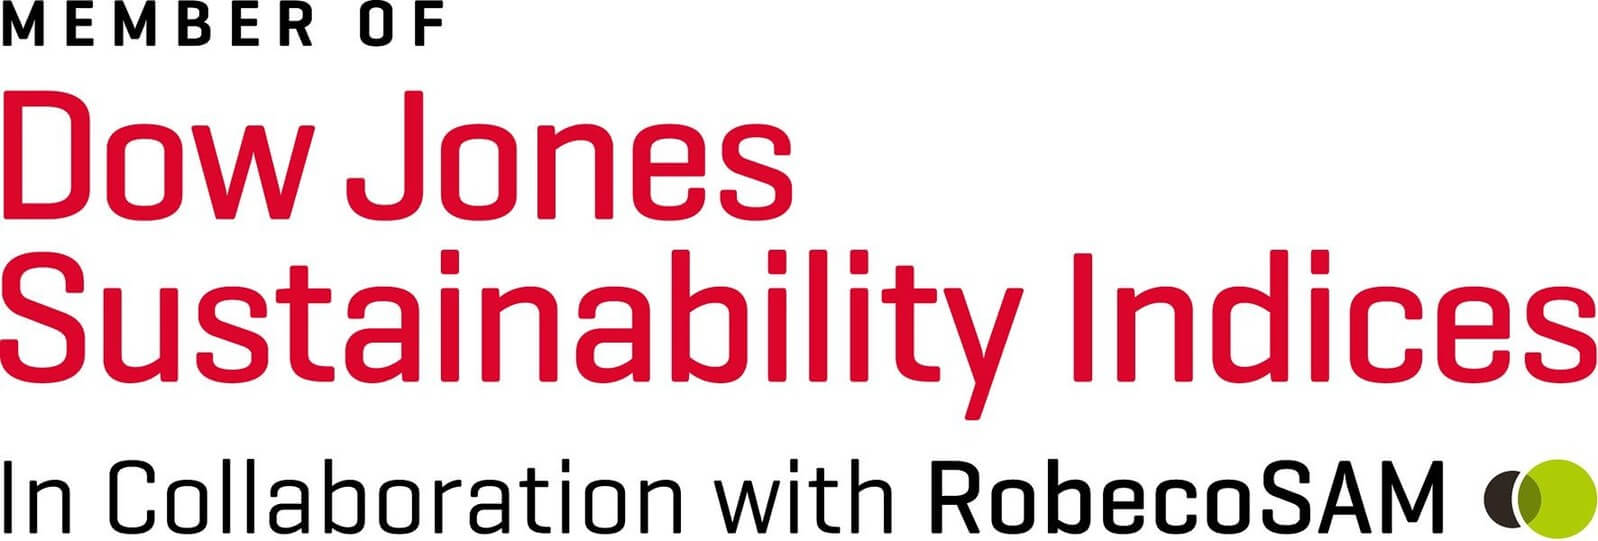 arcelik_membre_dow_jones_sustainability_indices.jpg